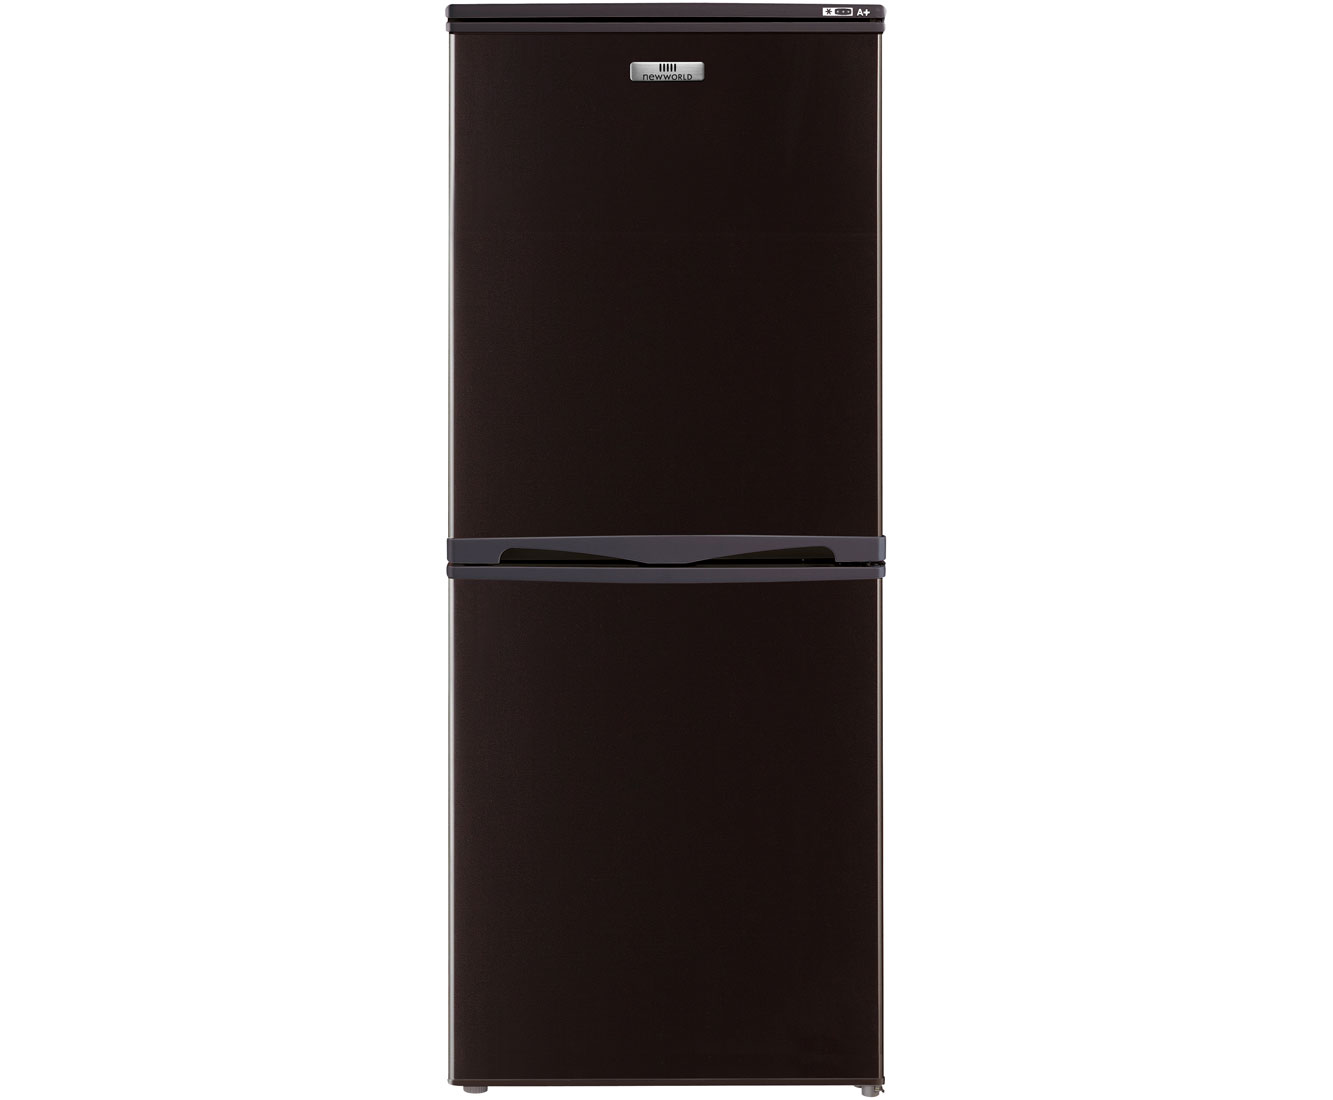 New World Kitchen Appliances Newworld Nwcom5012b 50 50 Fridge Freezer Black